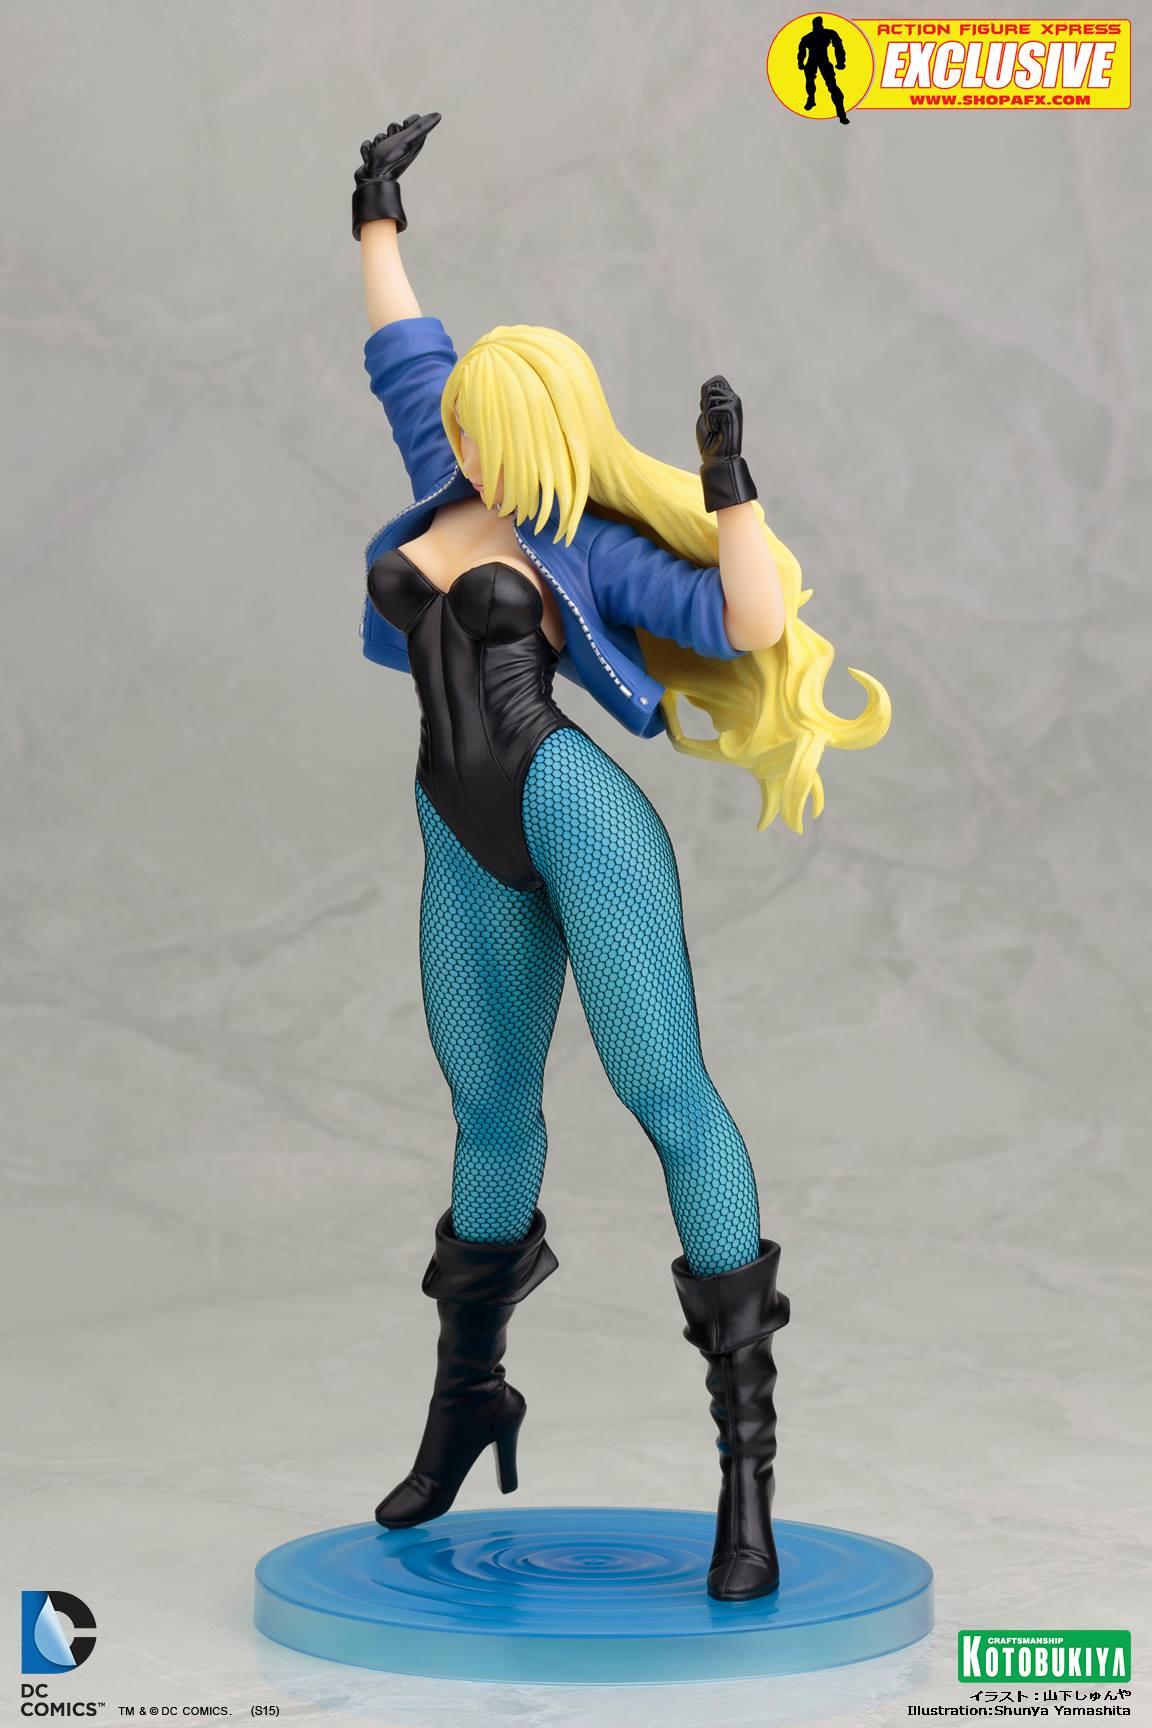 black-canary-classic-costume-bishoujo-statue-exclusive-dc-comics-kotobukiya-3